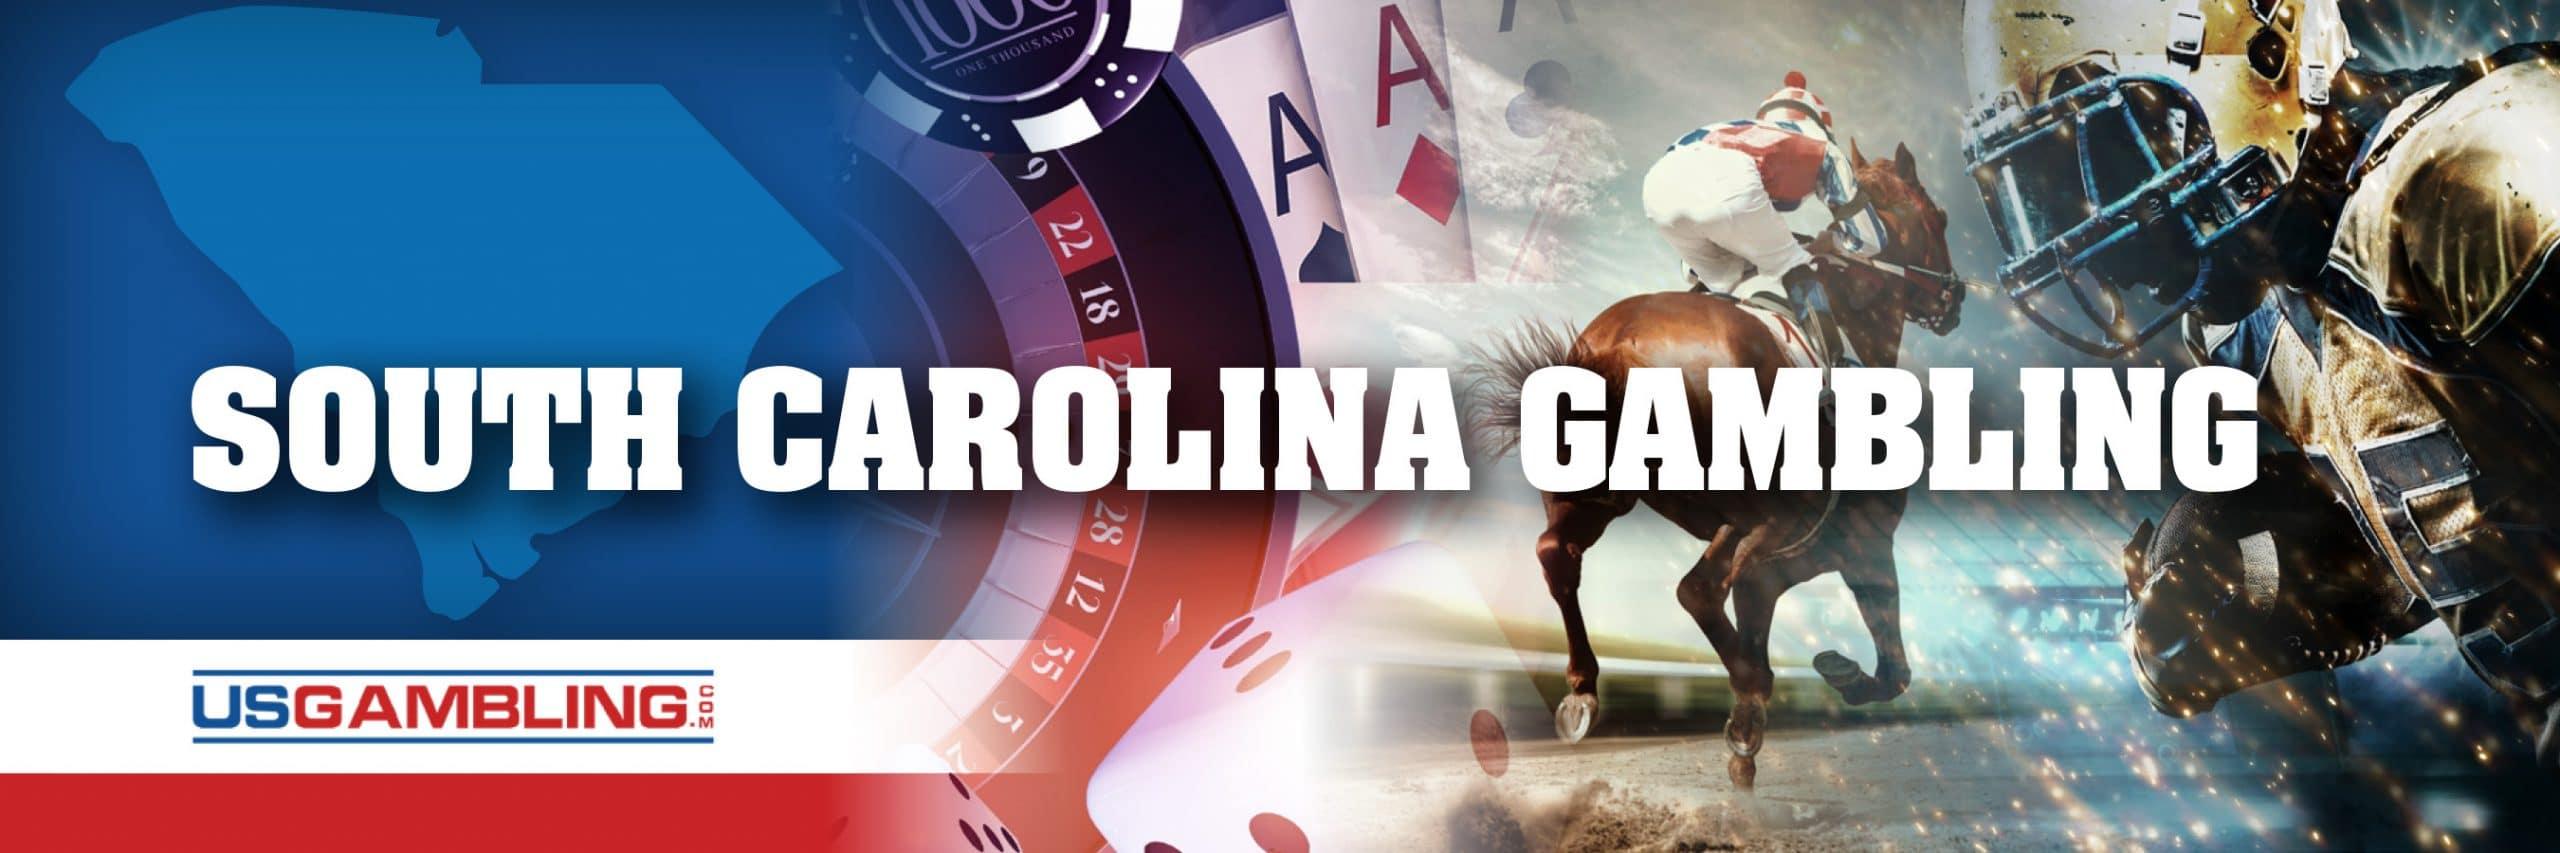 Legal South Carolina Gambling